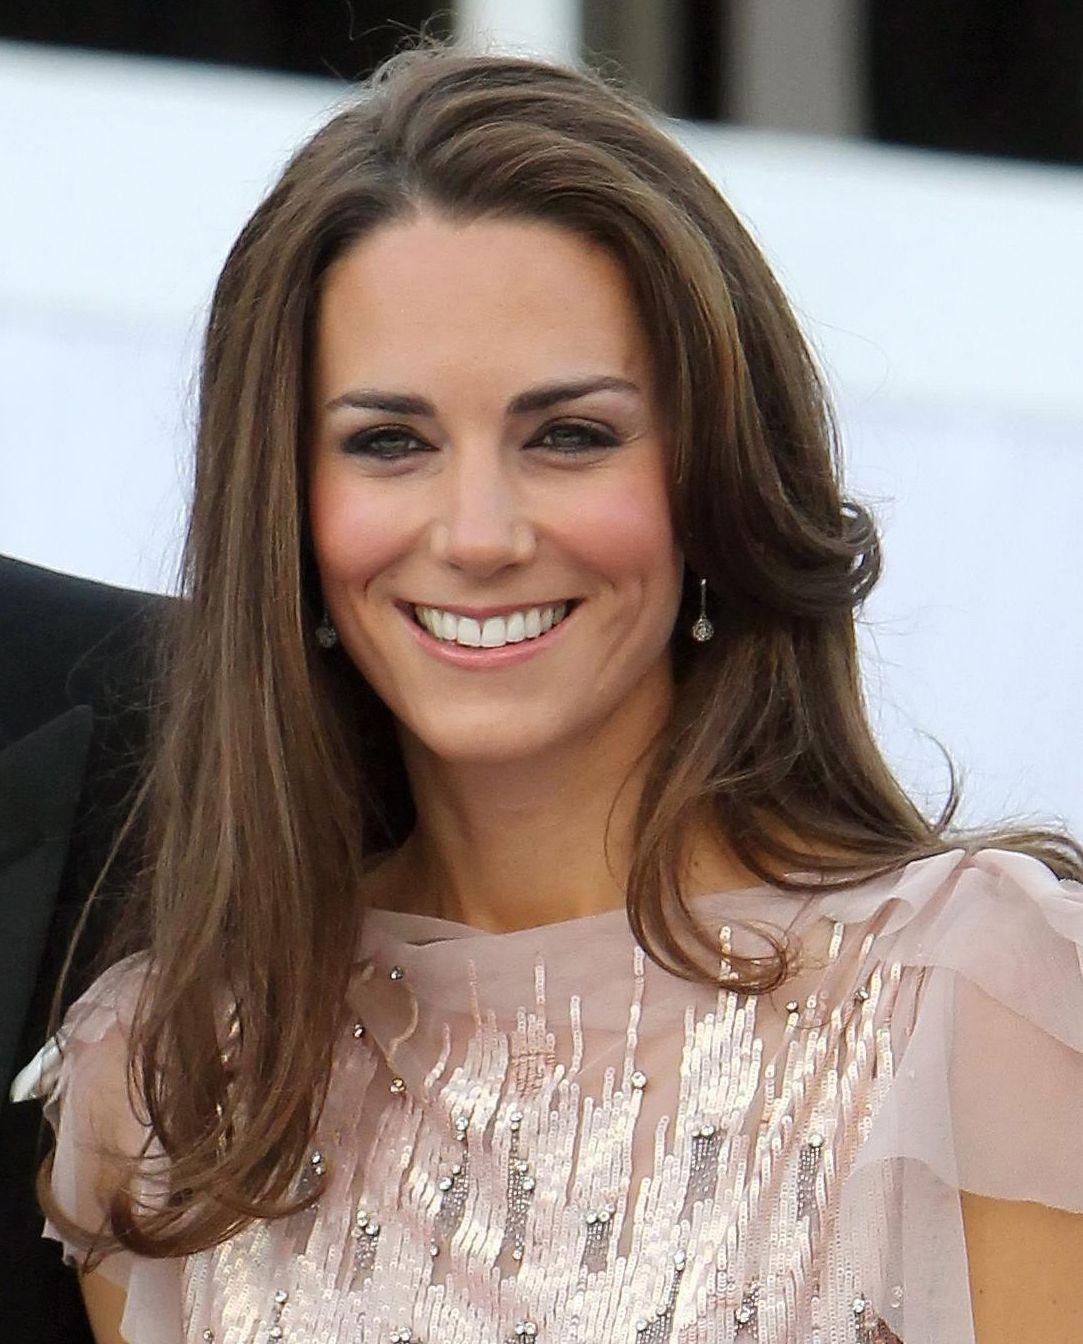 Kate Middleton Photo (Кейт Миддлтон Фото) супруга герцога Кембриджского Уильяма / Страница - 5